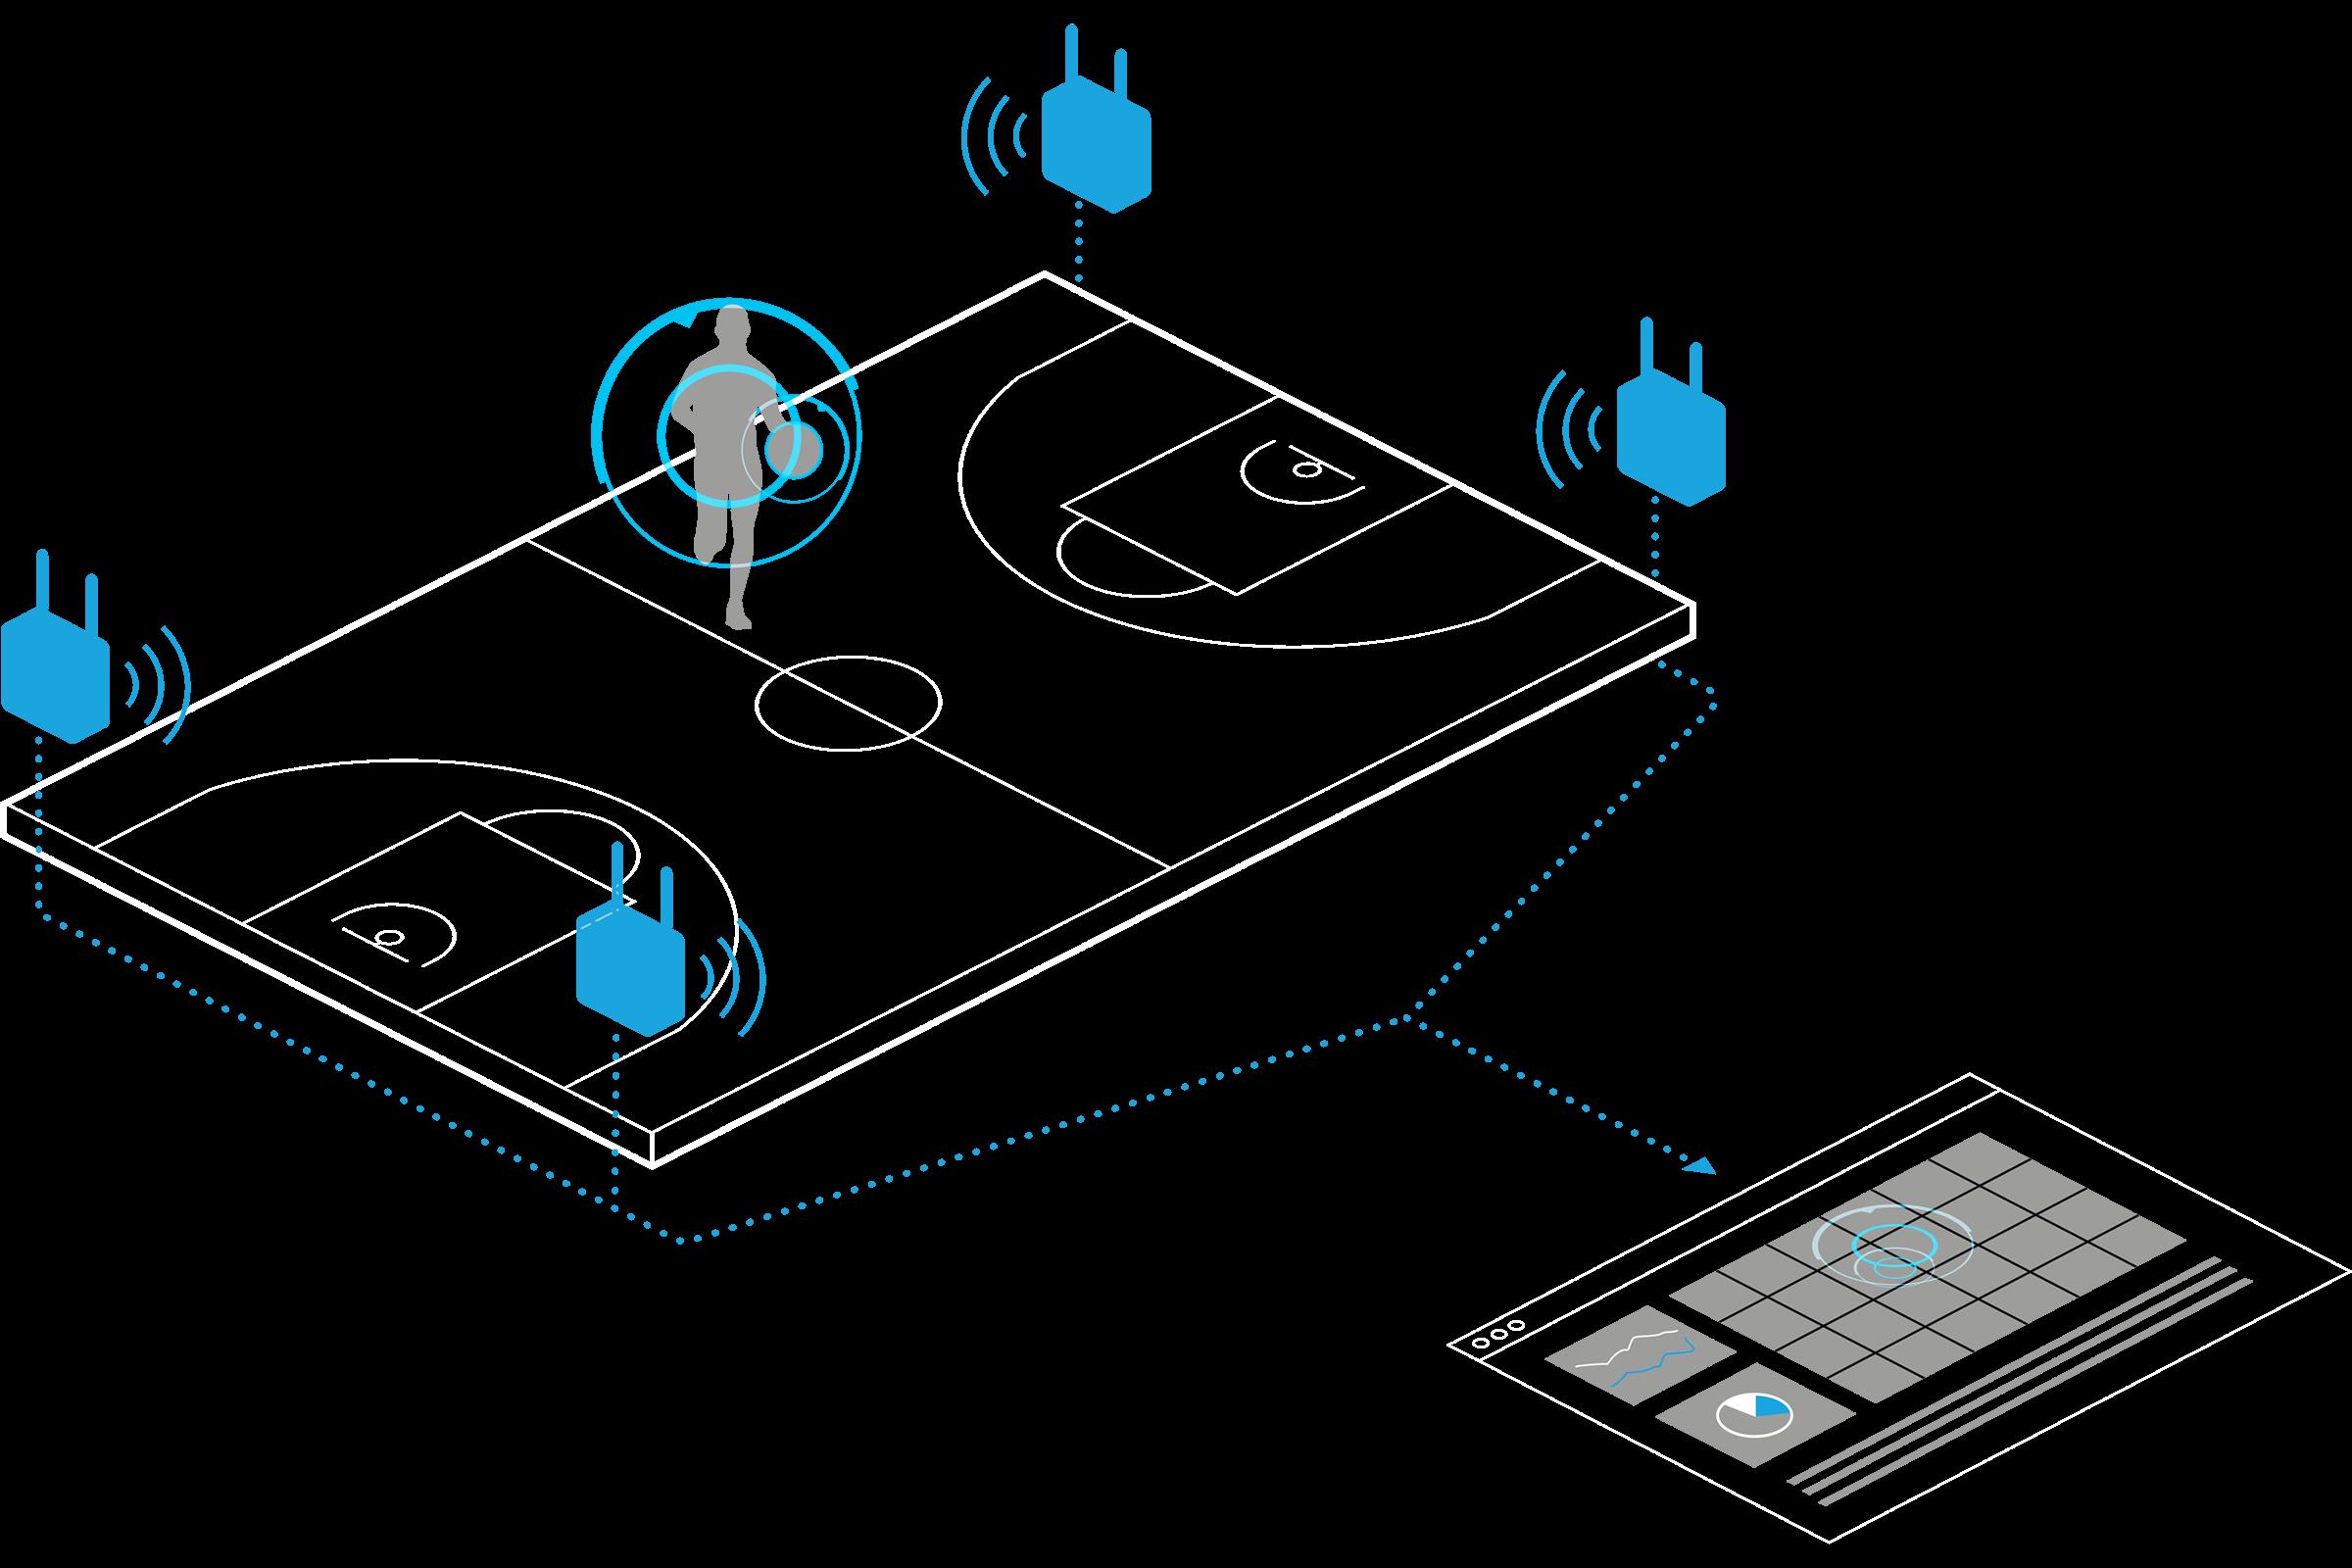 KINEXON system basketball court